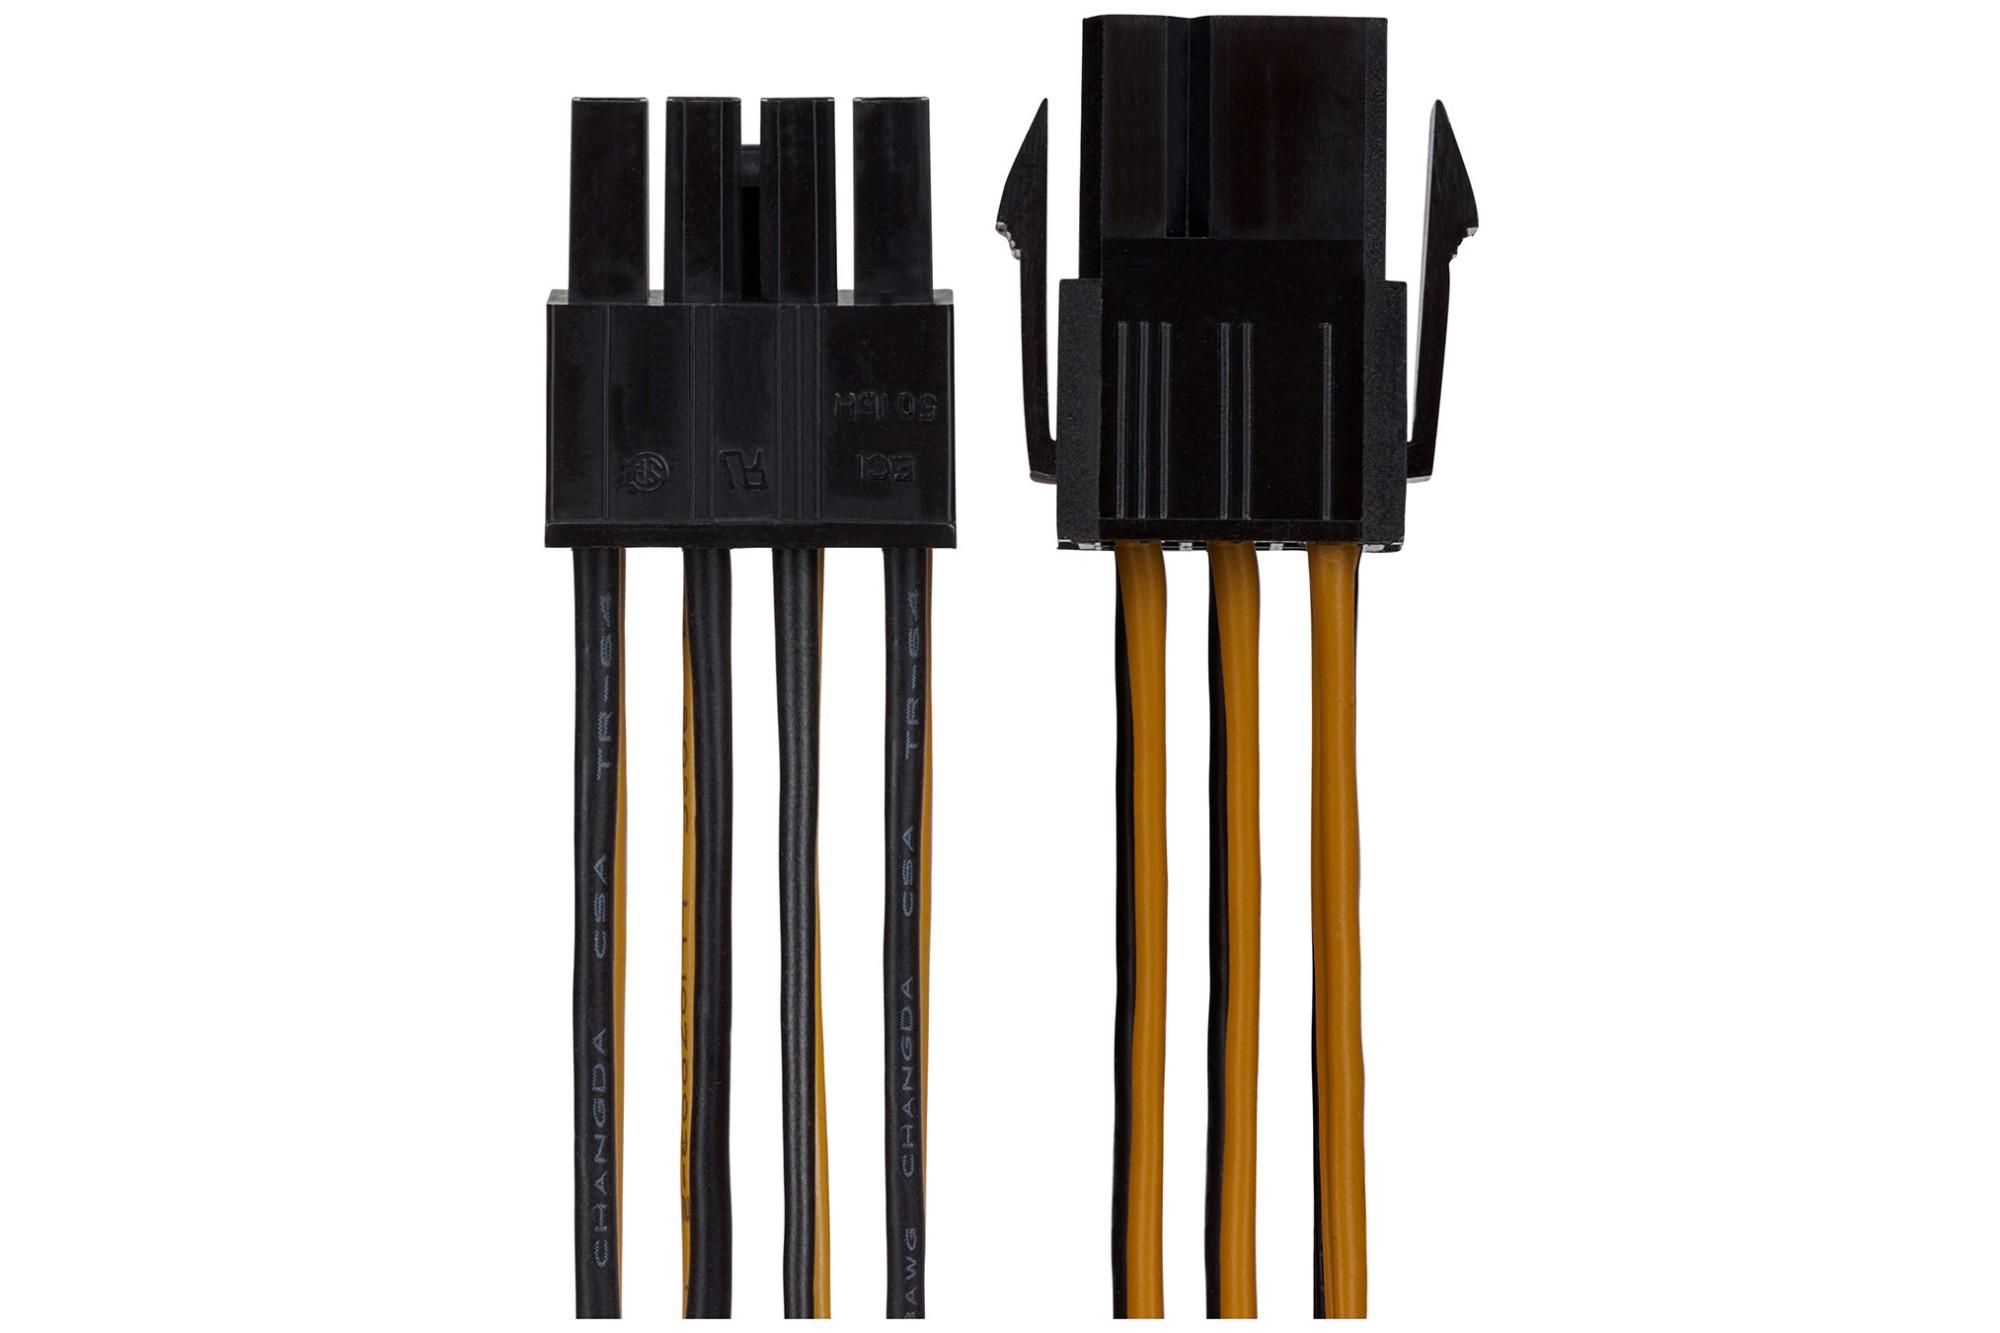 MAPLIN 6-pin PCIe Male to 8-pin ATX12V Female CPU Connector Lead 150mm